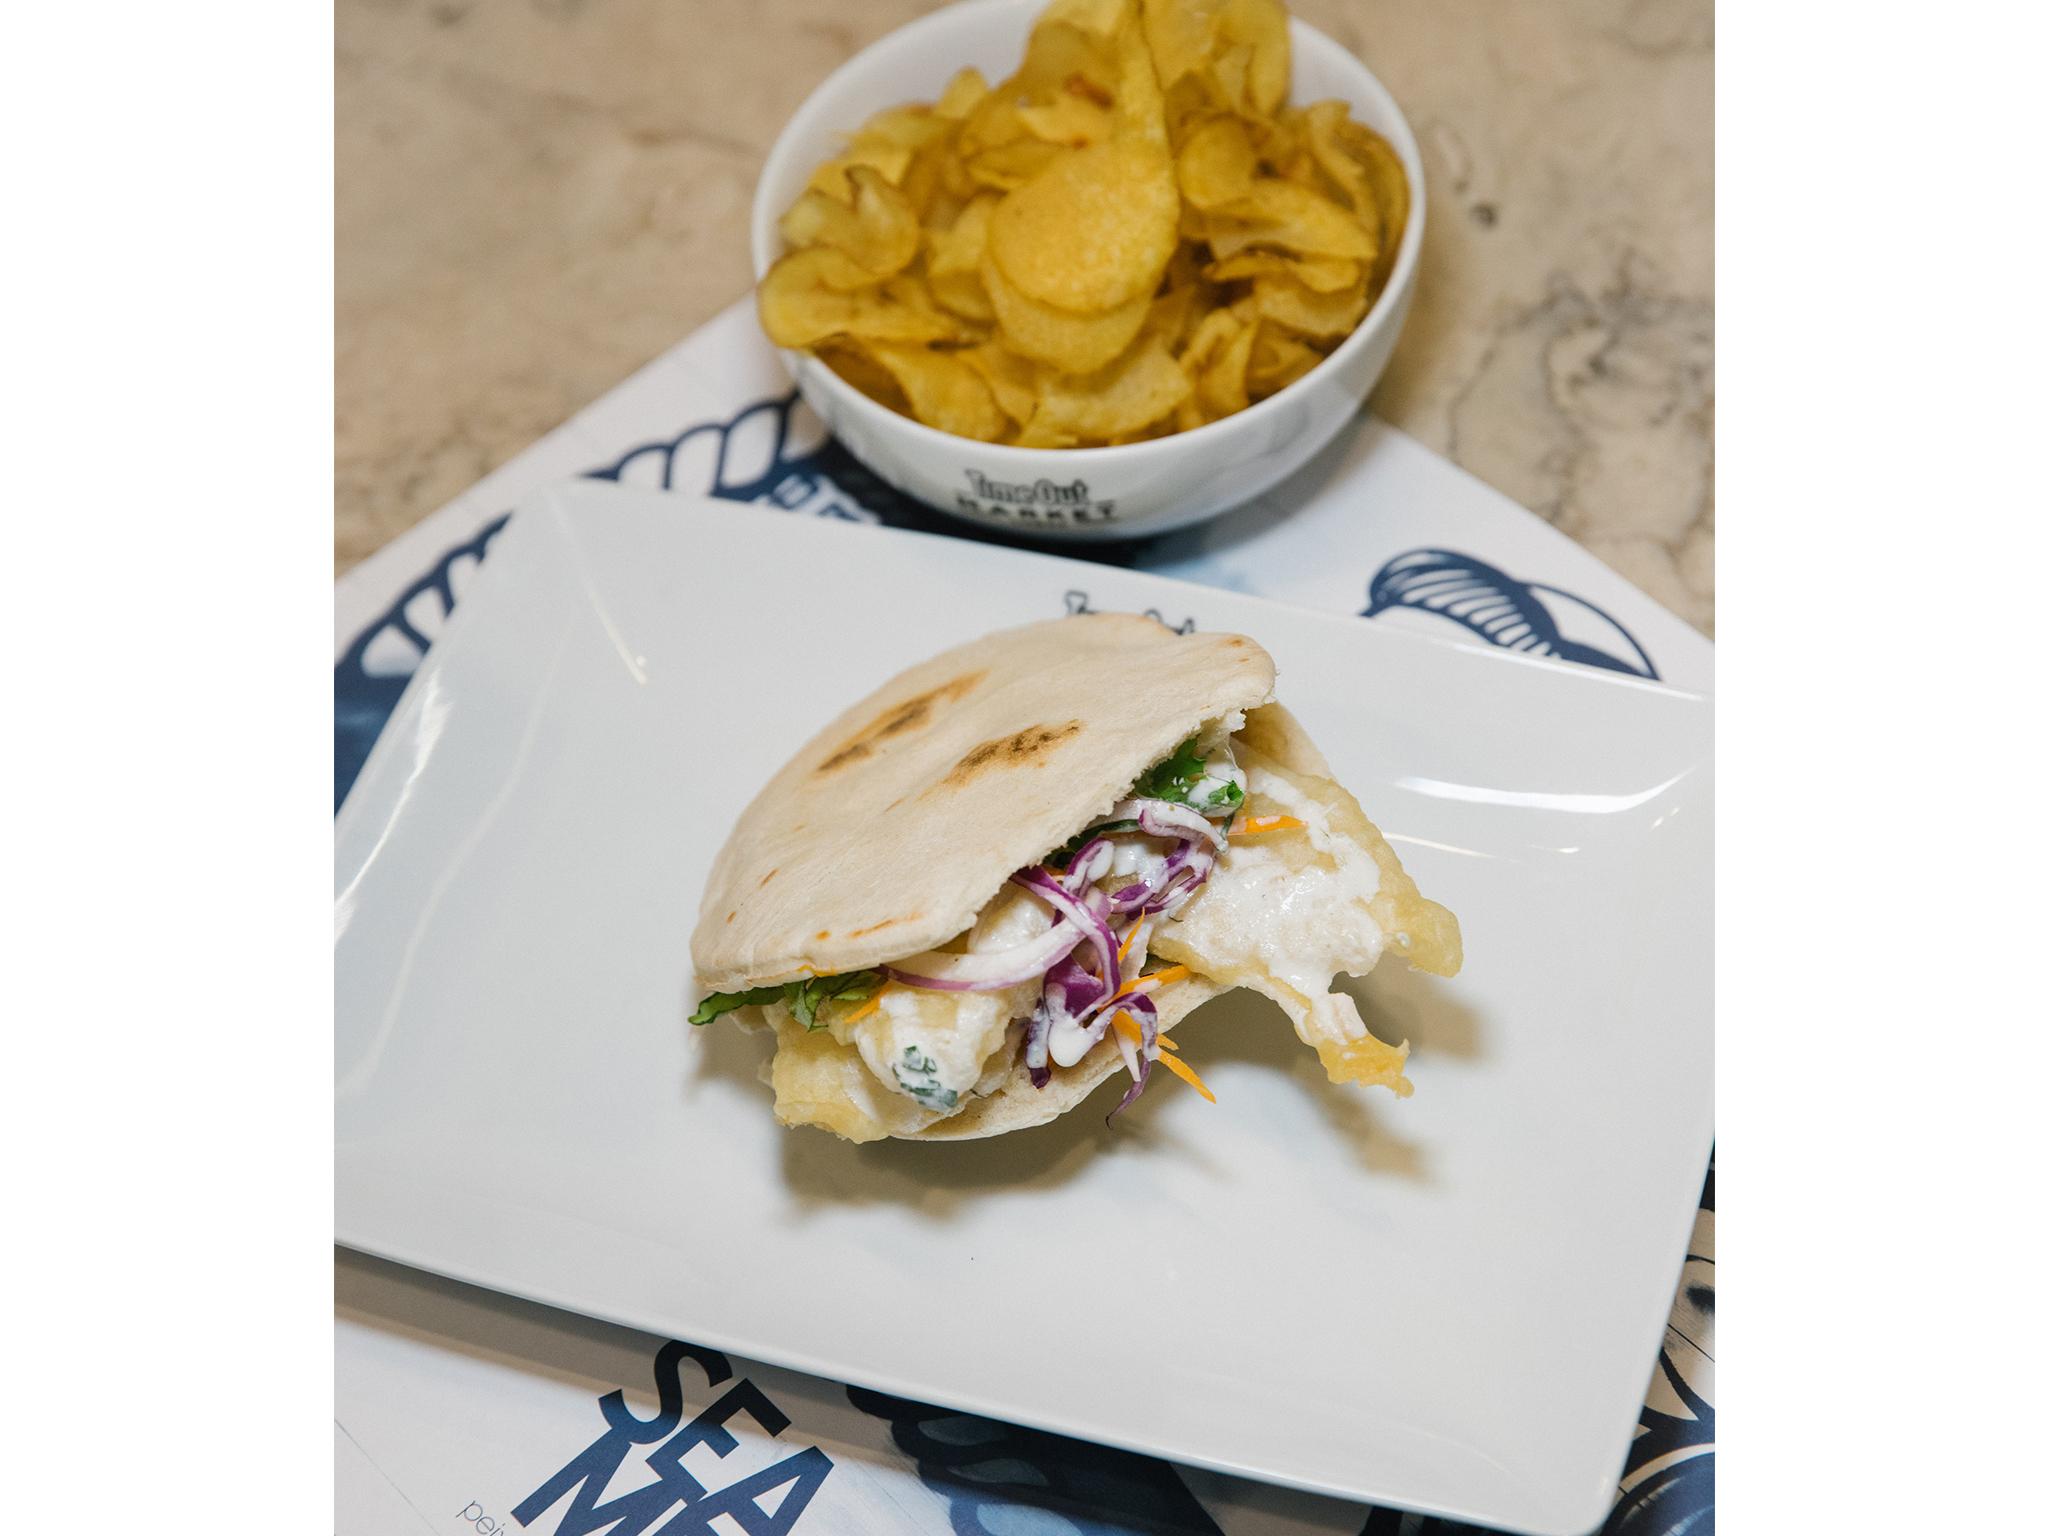 Restaurante, Sea Me, Time Out Market, Pita shoarma de bacalhau